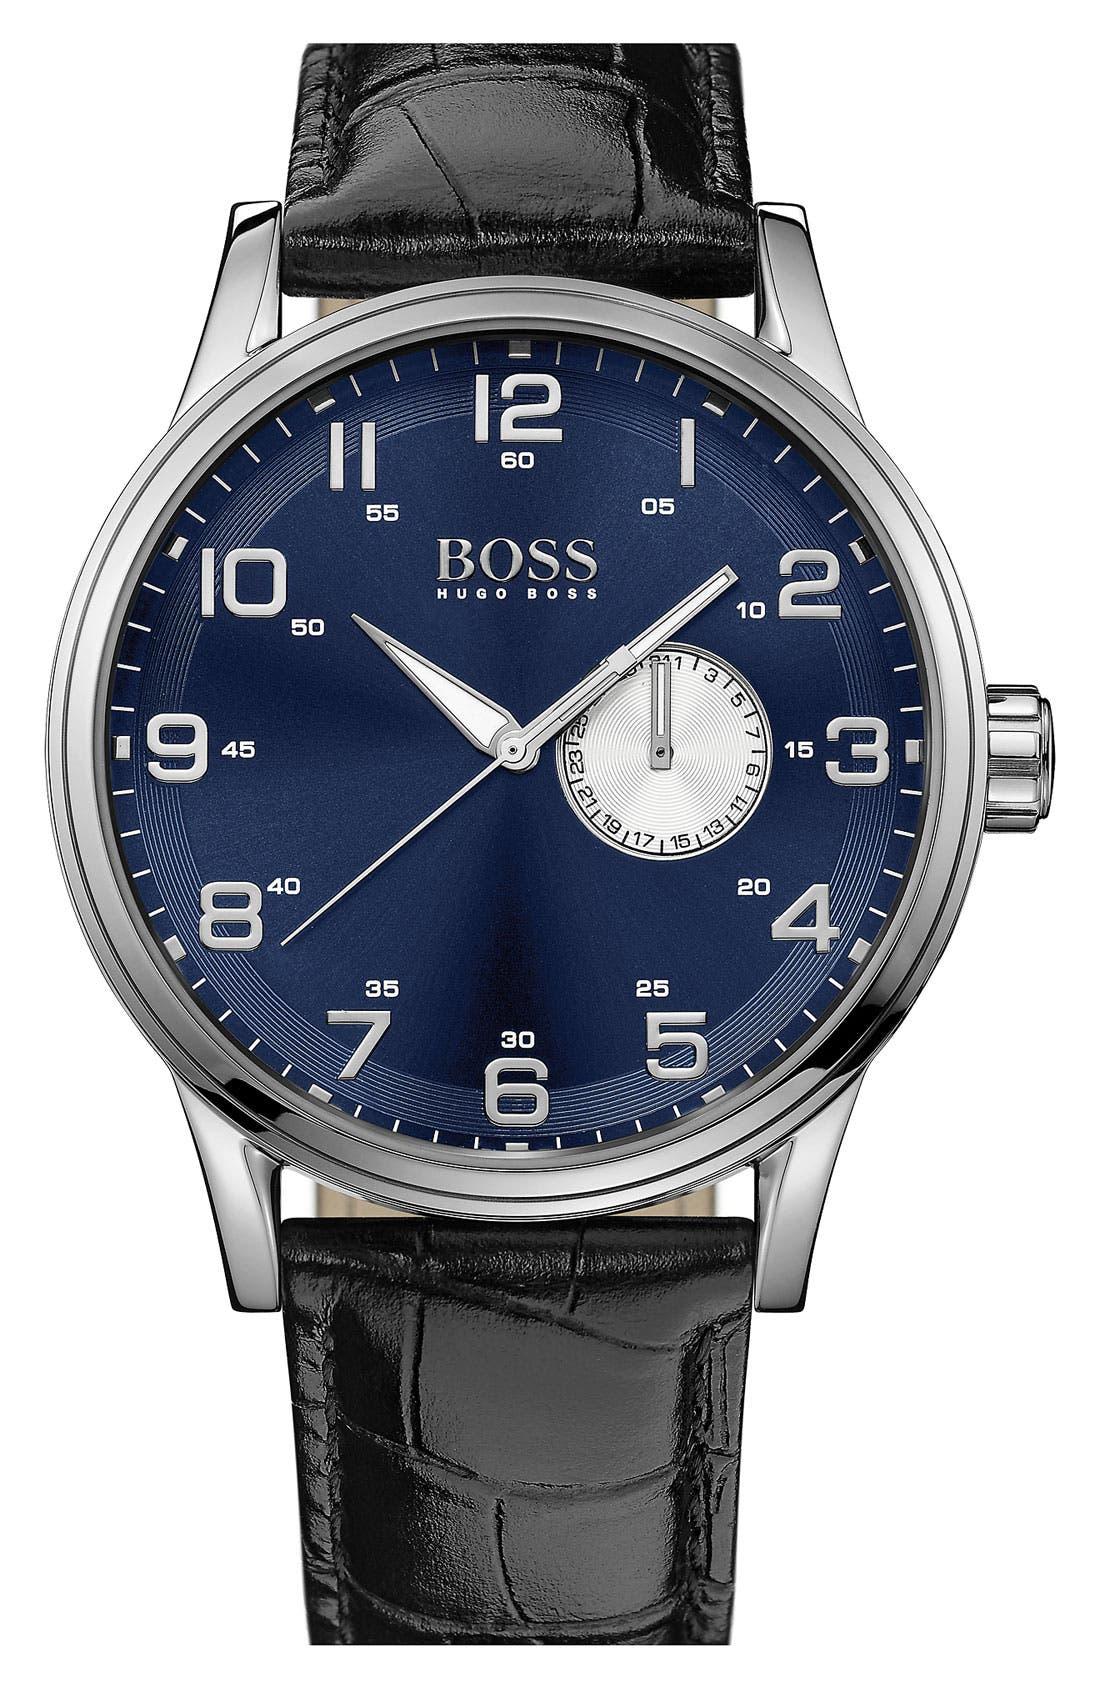 Main Image - BOSS HUGO BOSS 'Aviator' Round Leather Strap Watch, 44mm